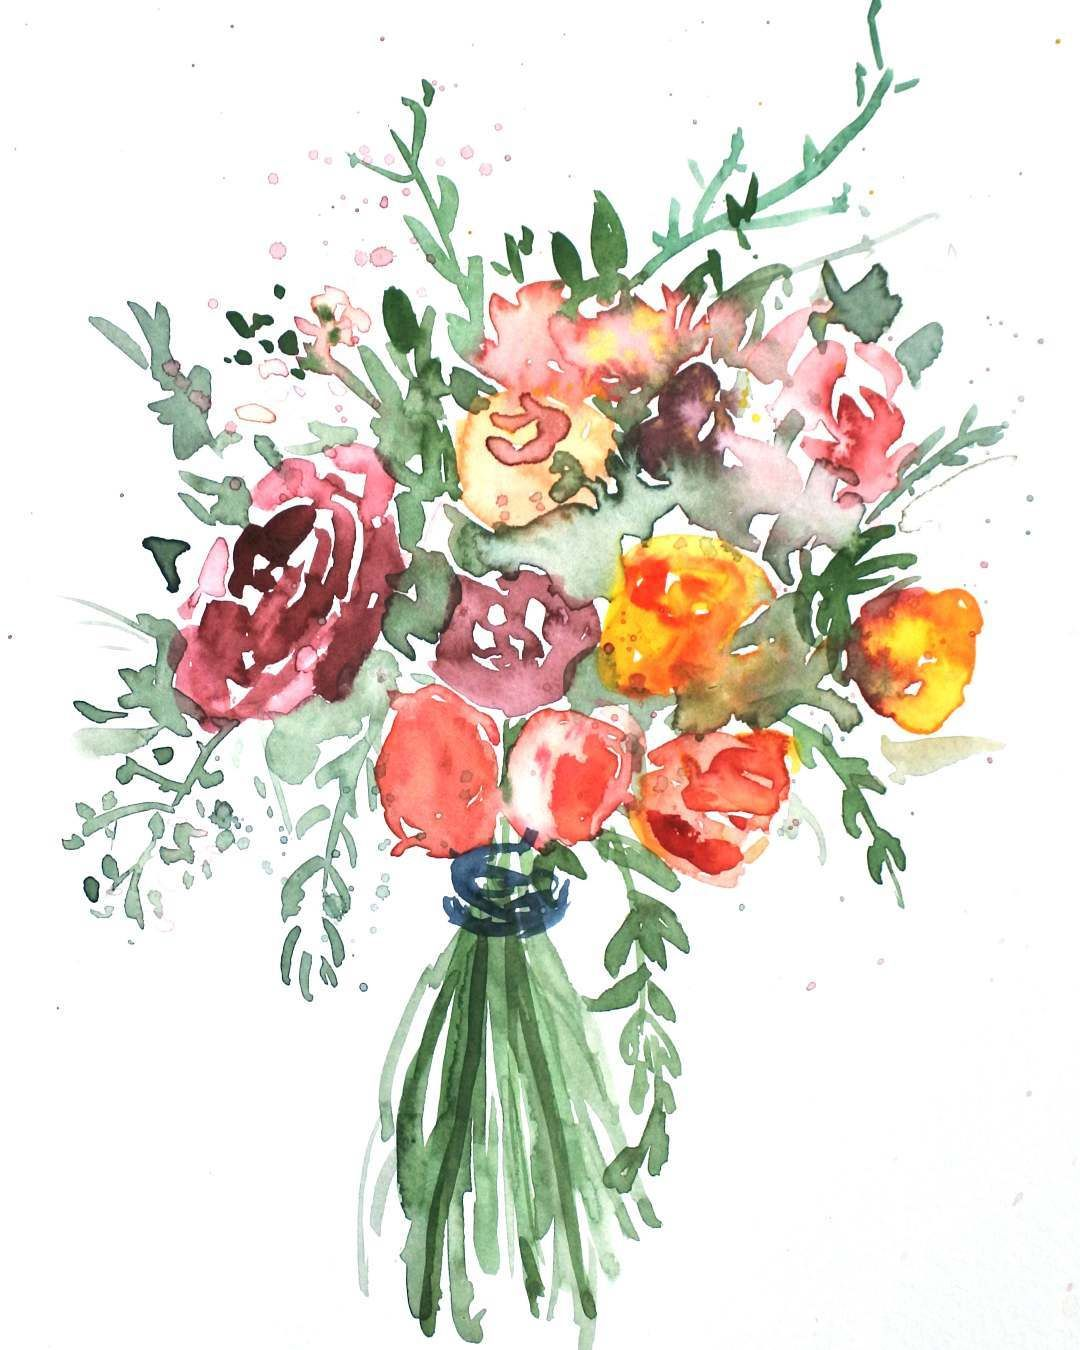 Illustration Watercolor Painting Flowers Bouquet Floral